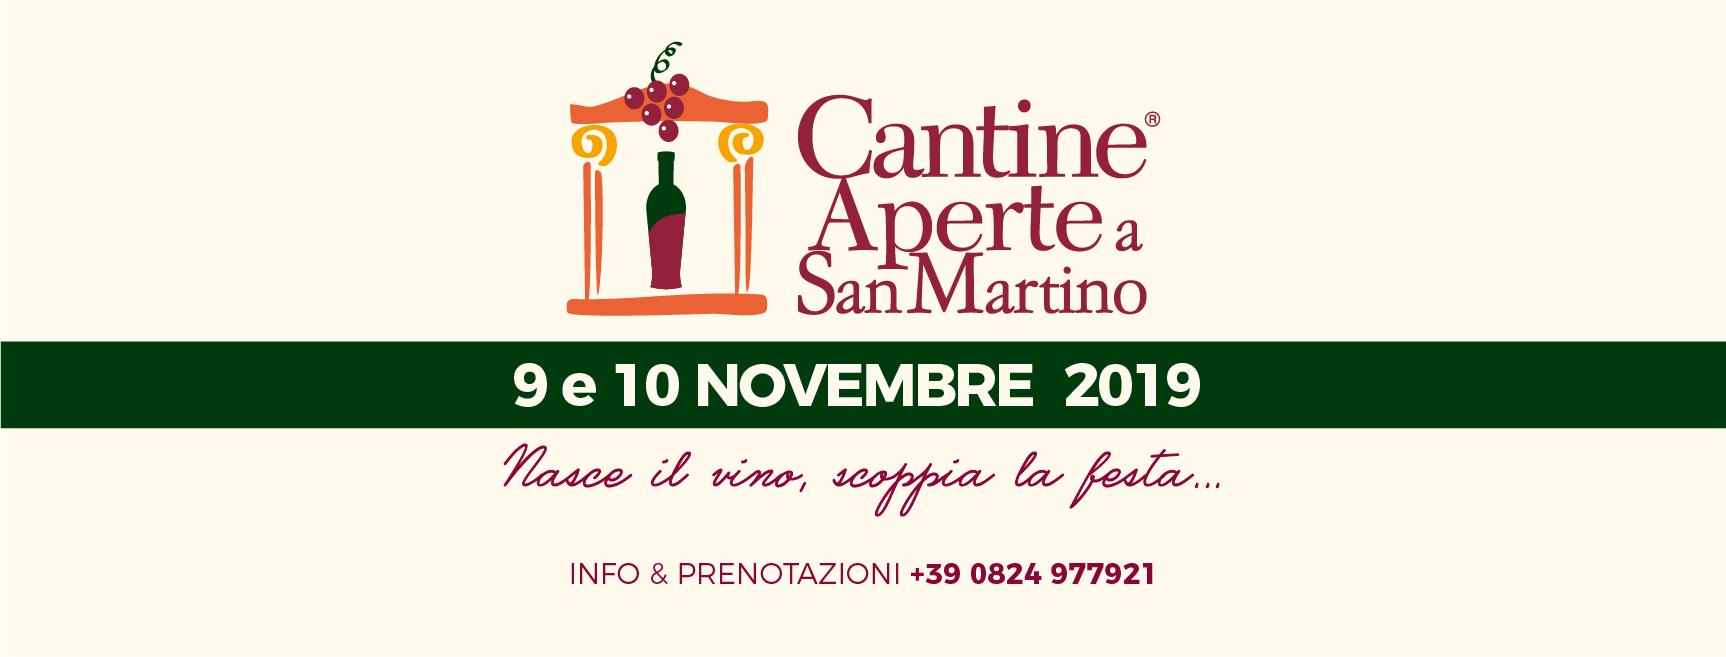 Cantine Aperte a San Martino 9 e 10 Novembre 2019